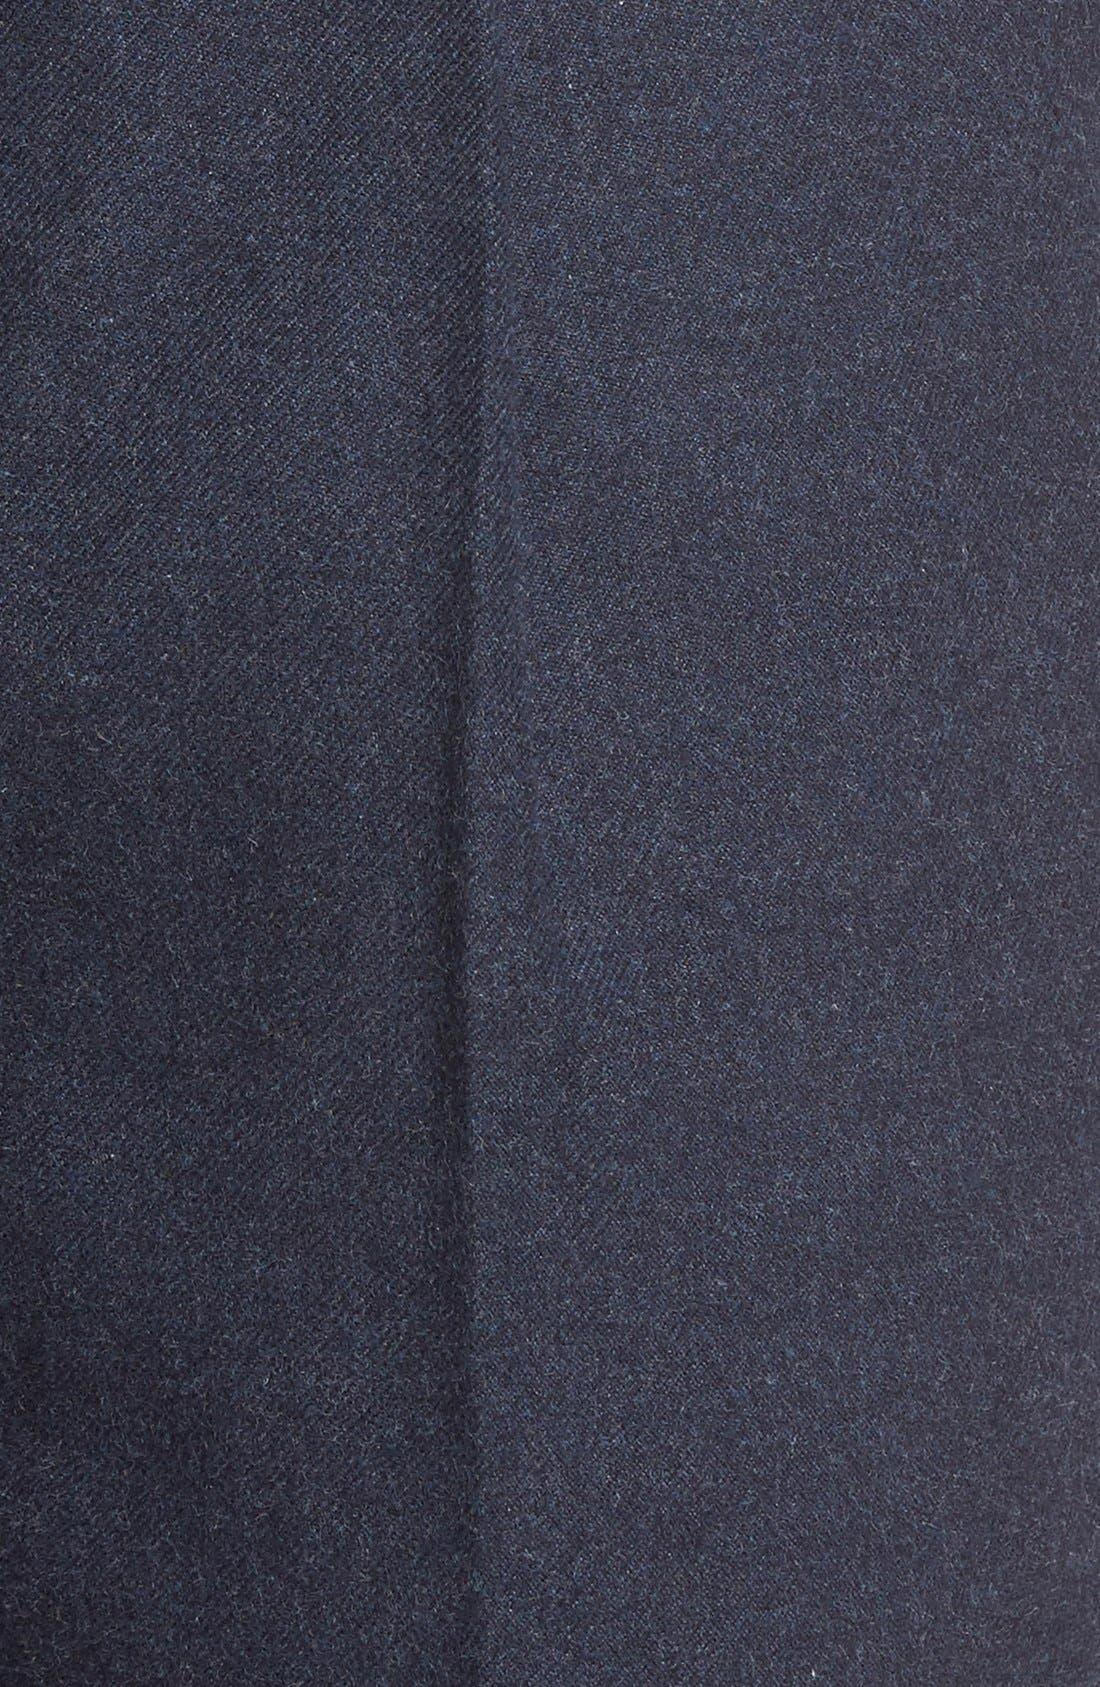 BONOBOS,                             Slim Fit Flannel Trousers,                             Alternate thumbnail 9, color,                             400